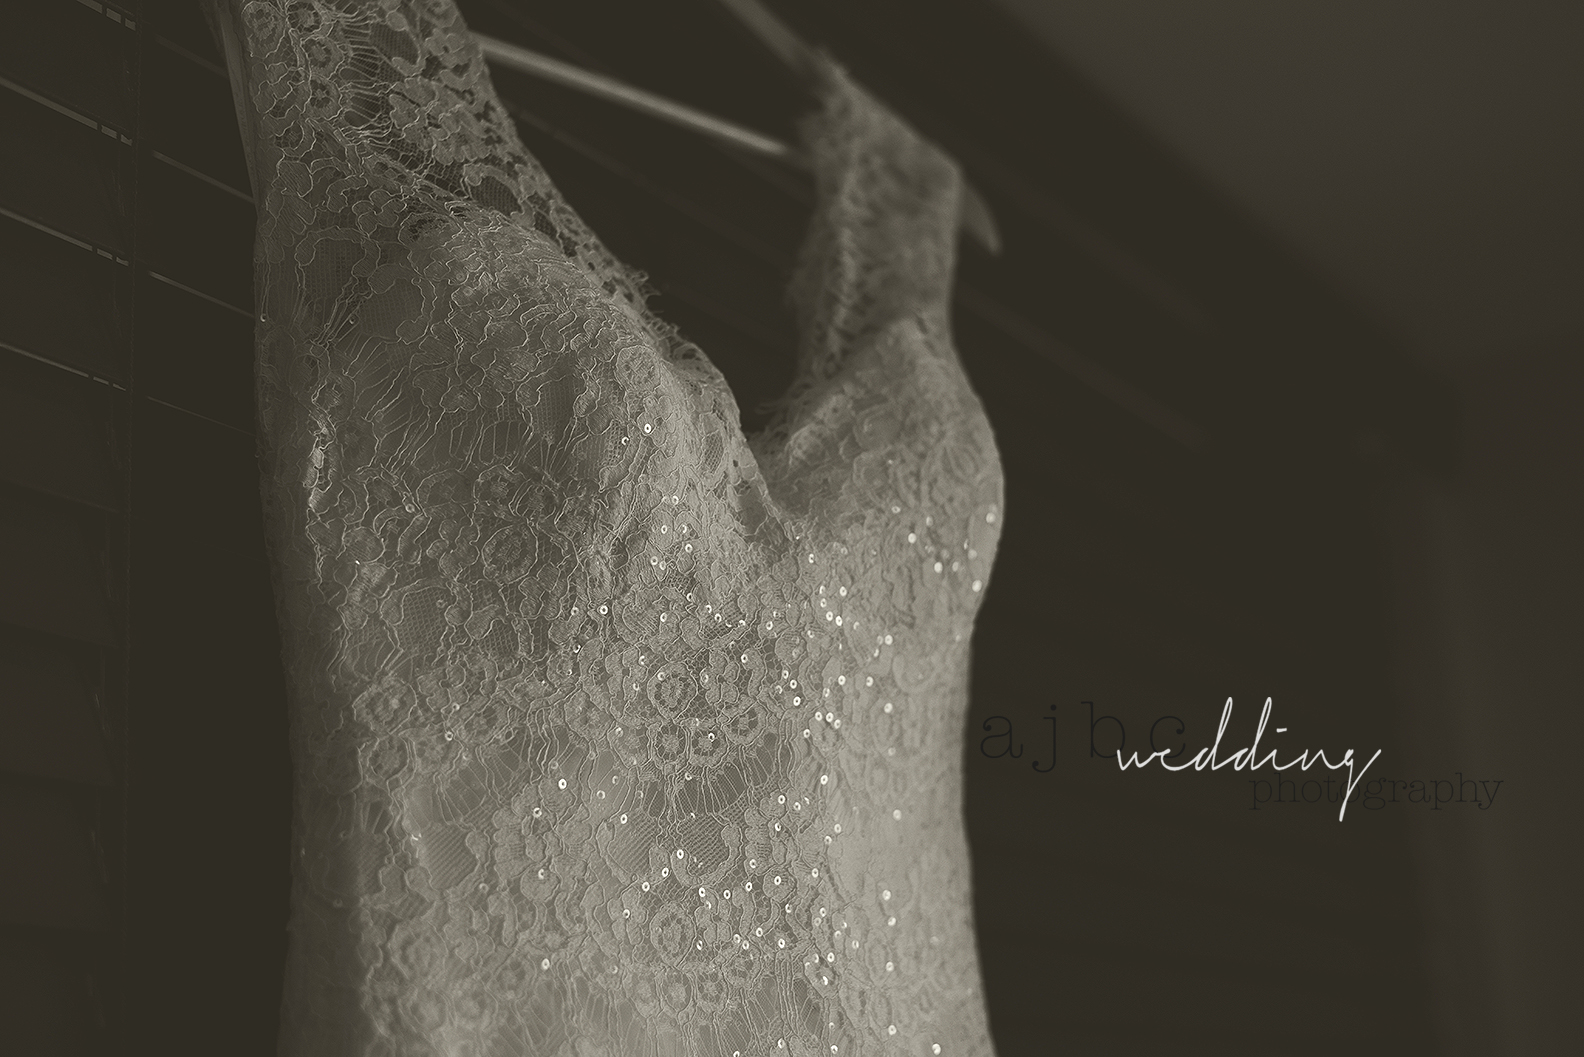 wedding dress ajbcphotography-port-huron-michigan-wedding-photographer-outdoors-summer-wedding-country-wedding-wadhams-michigan-bride-groom-love-wedding-dress.jpg